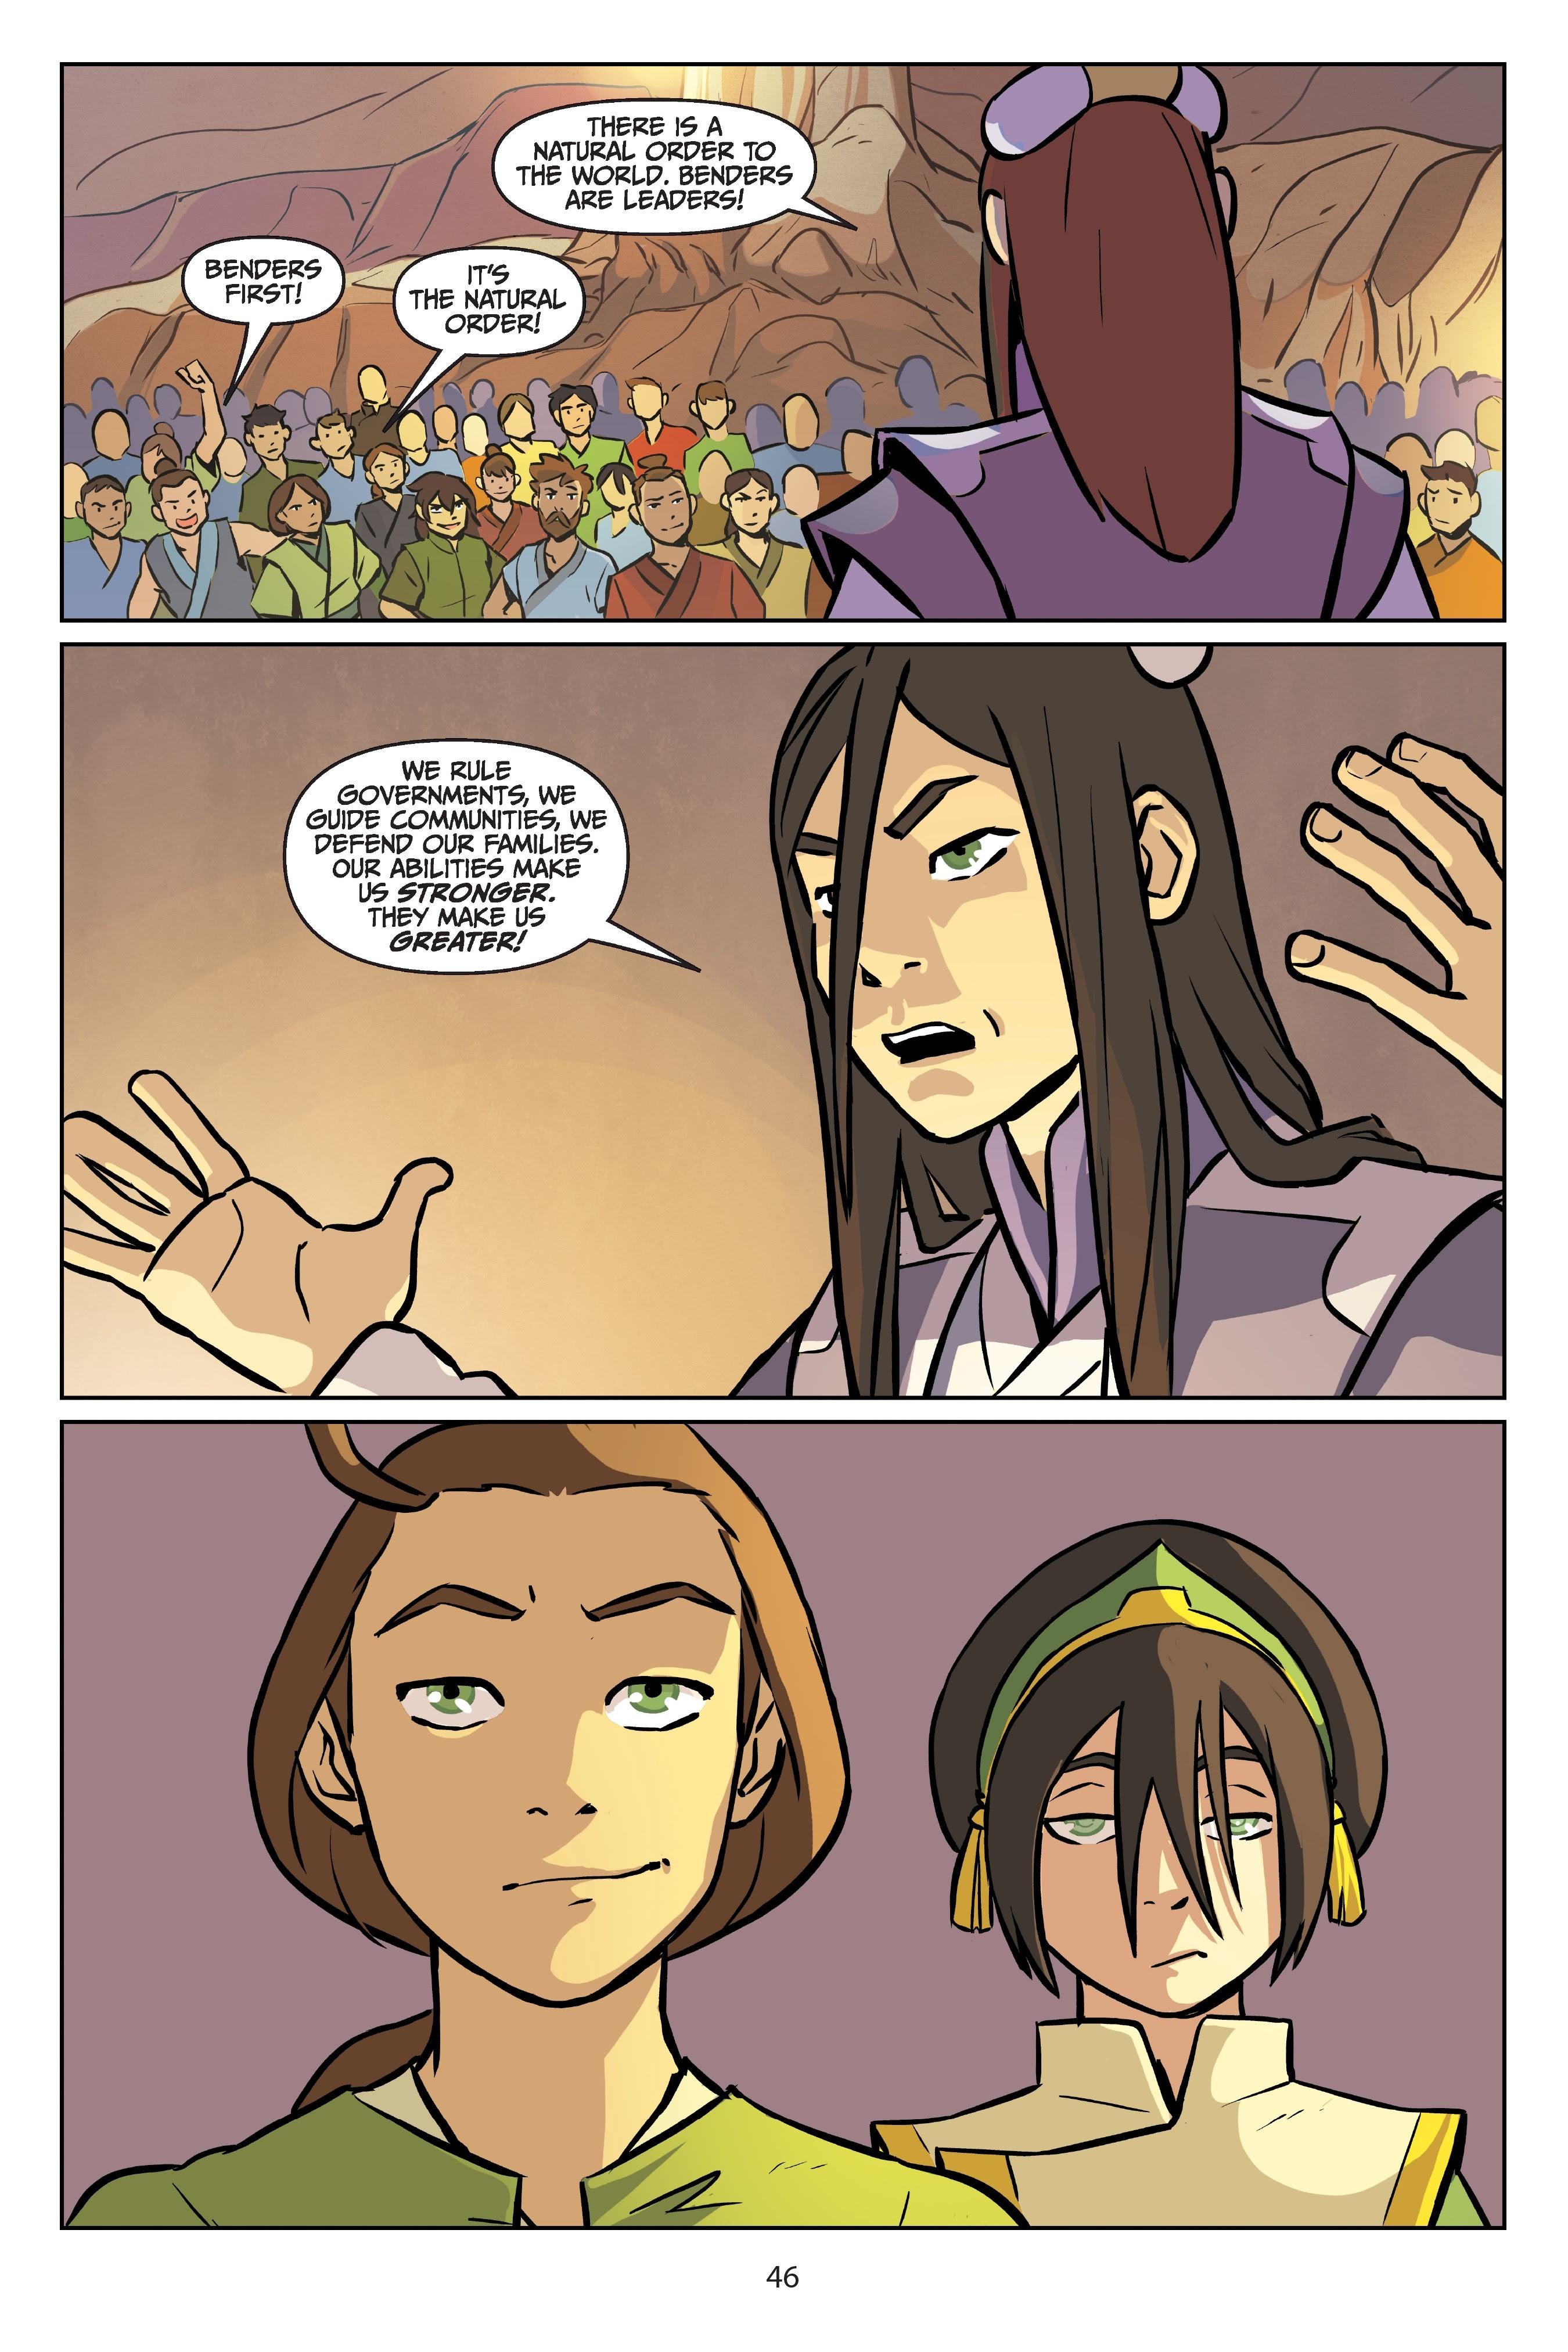 Nickelodeon Avatar: The Last Airbender - Imbalance TPB_2 Page 46